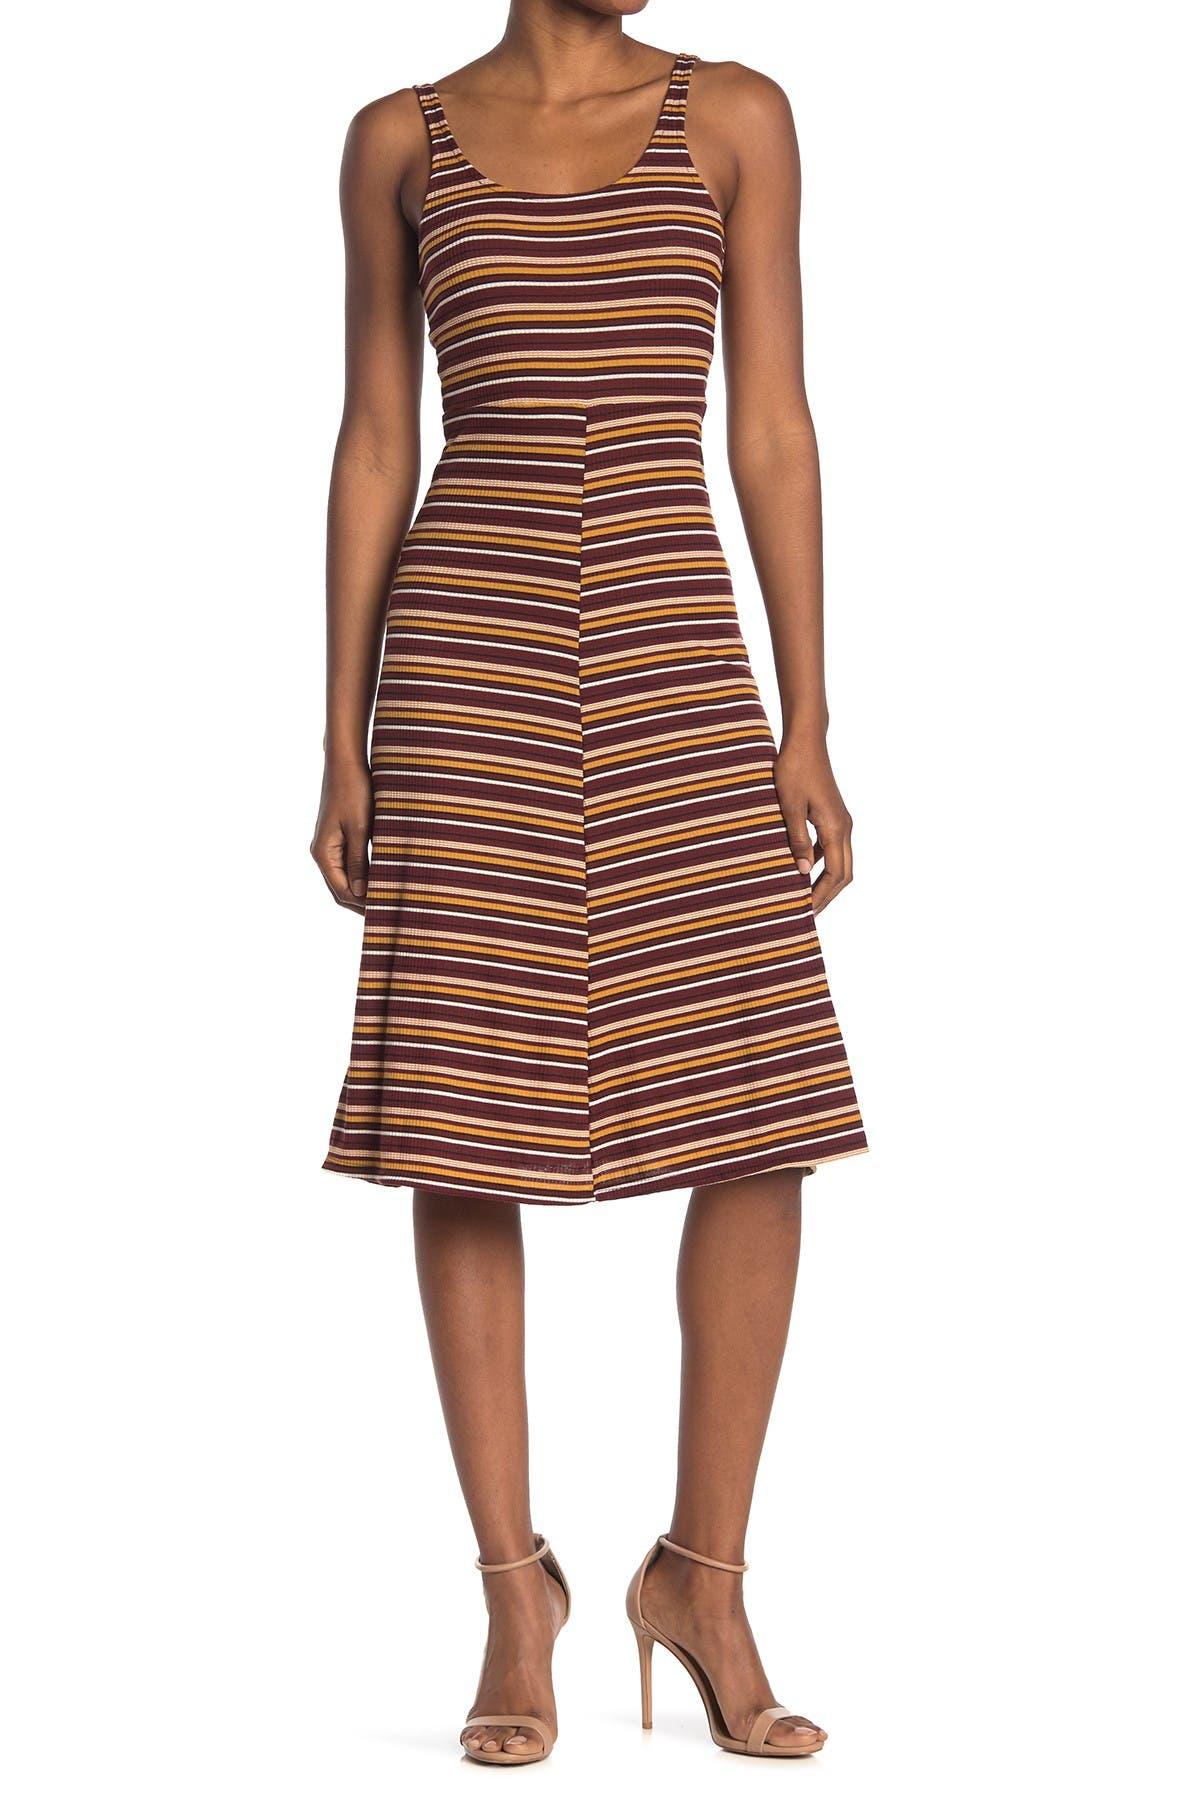 Image of Velvet Torch Ribbed Tank A-Line Midi Dress